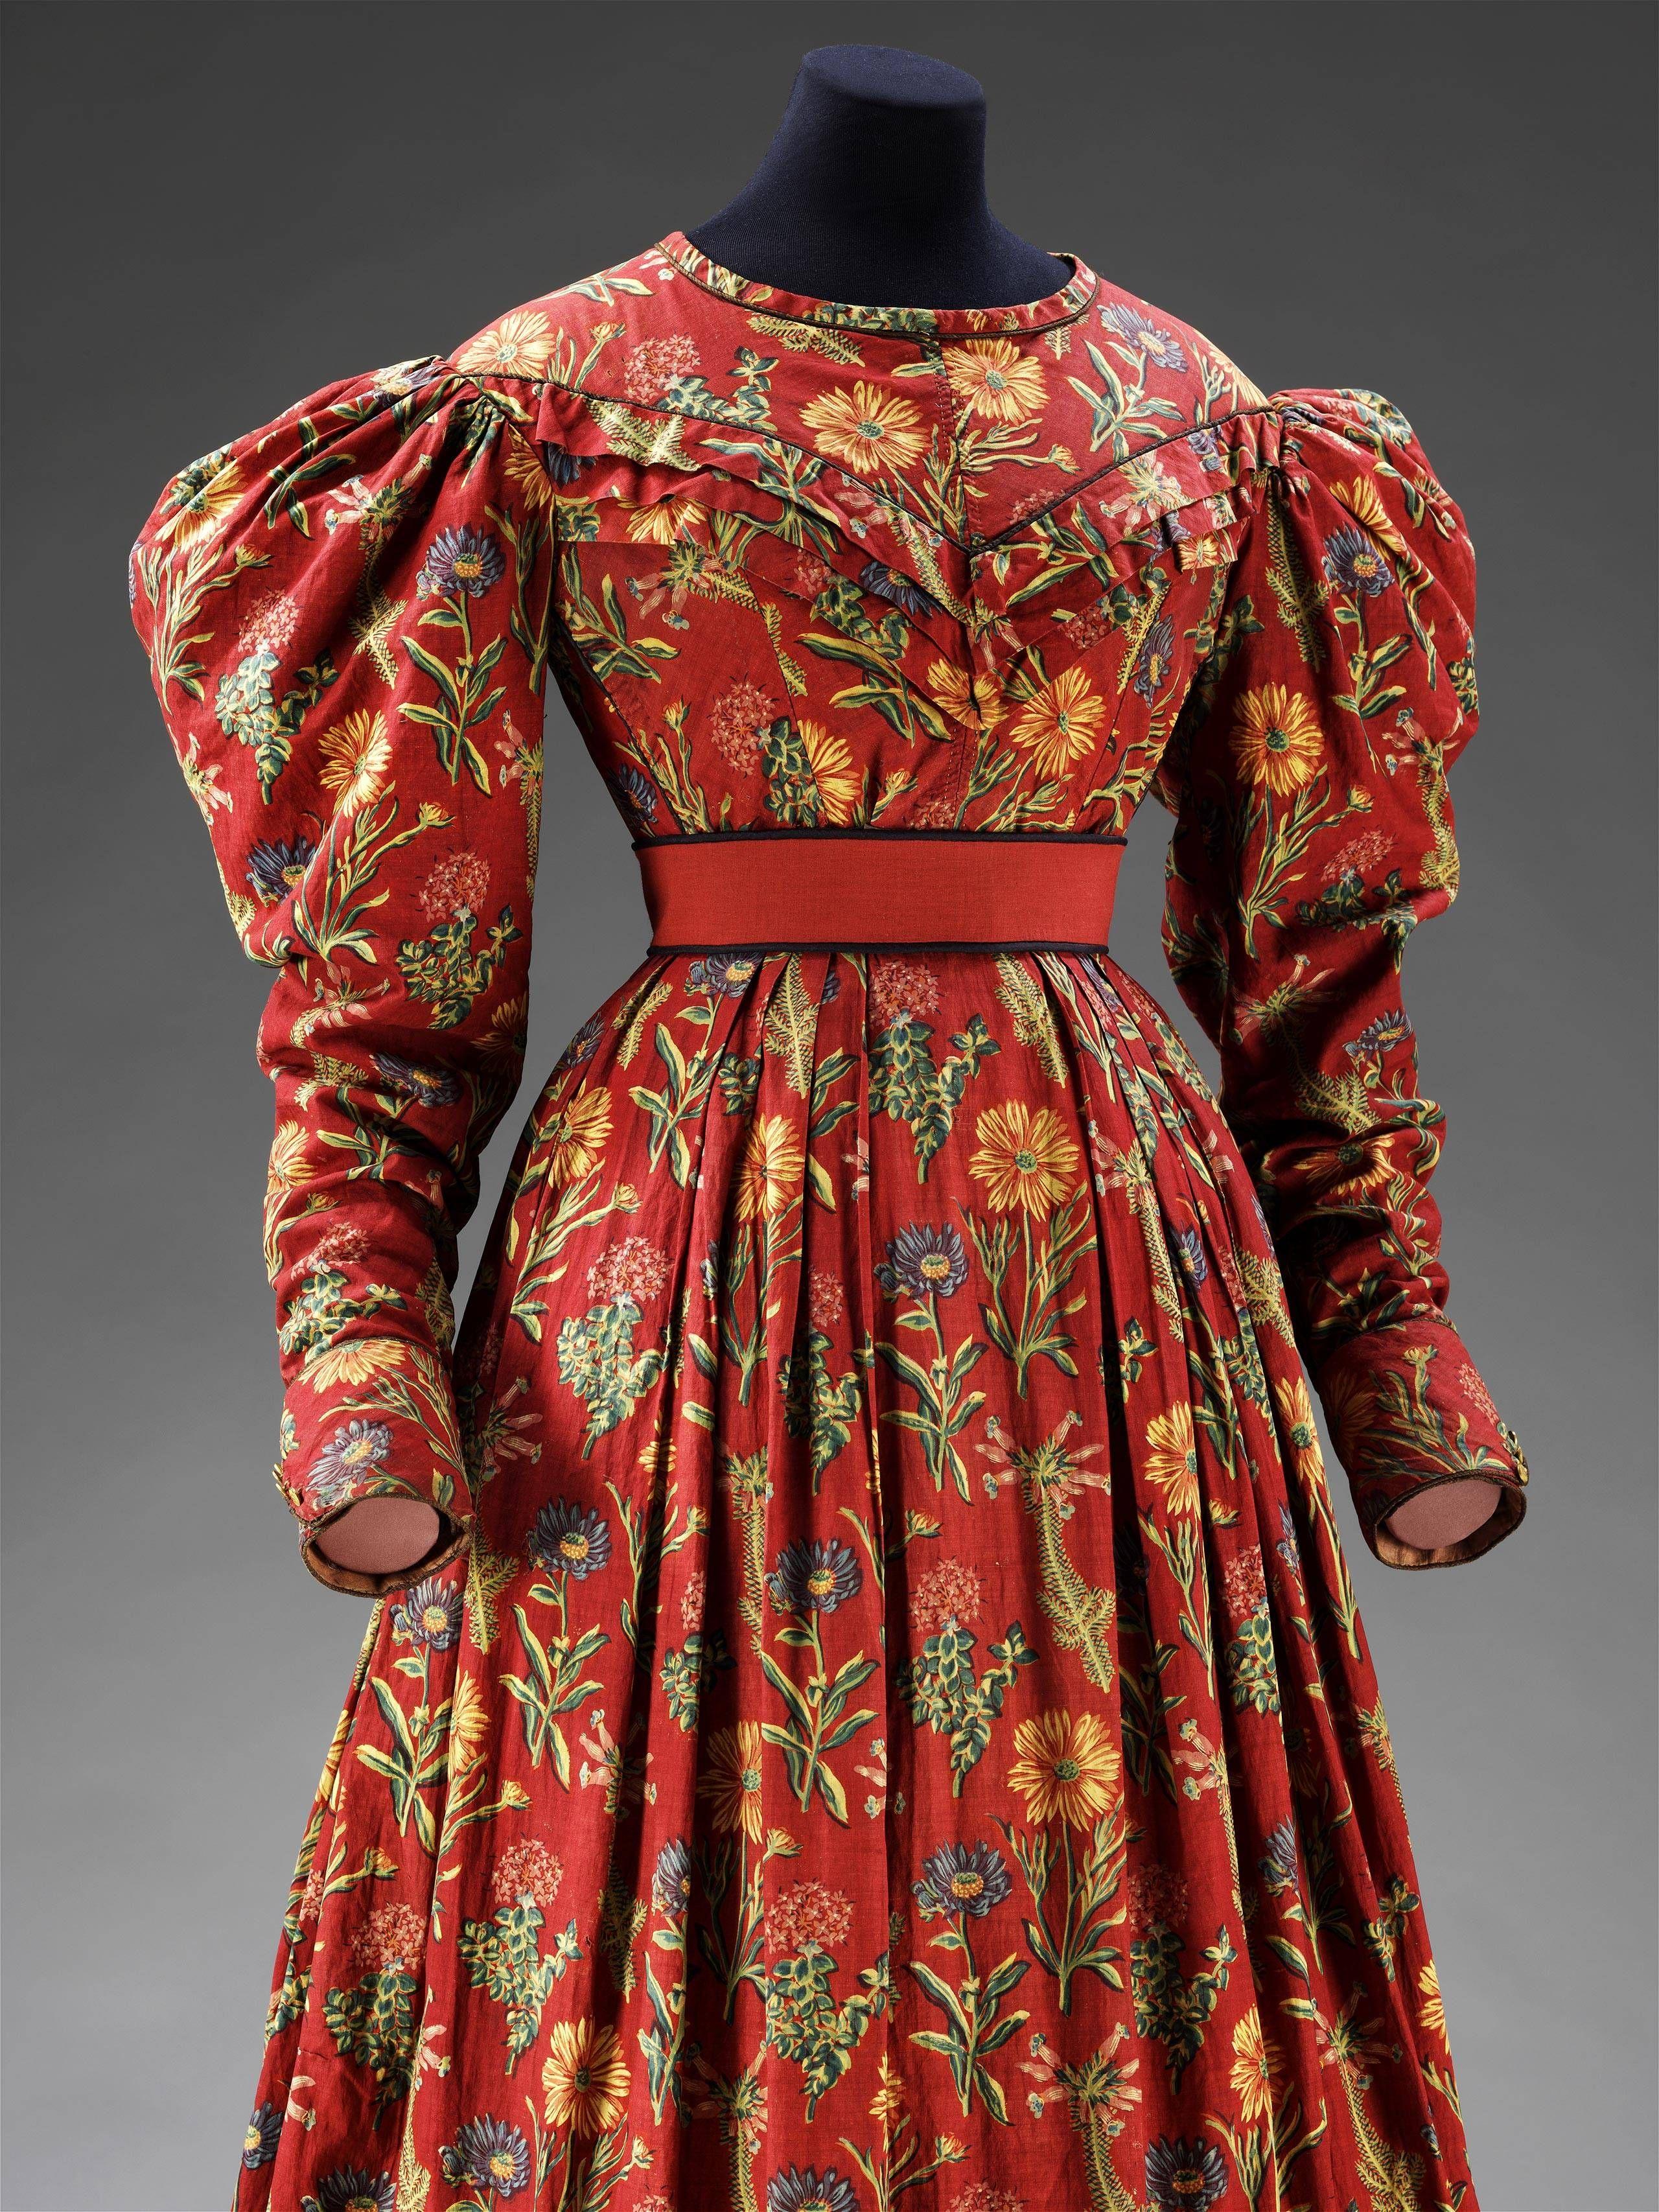 Pin On Fashion History 1825 1850